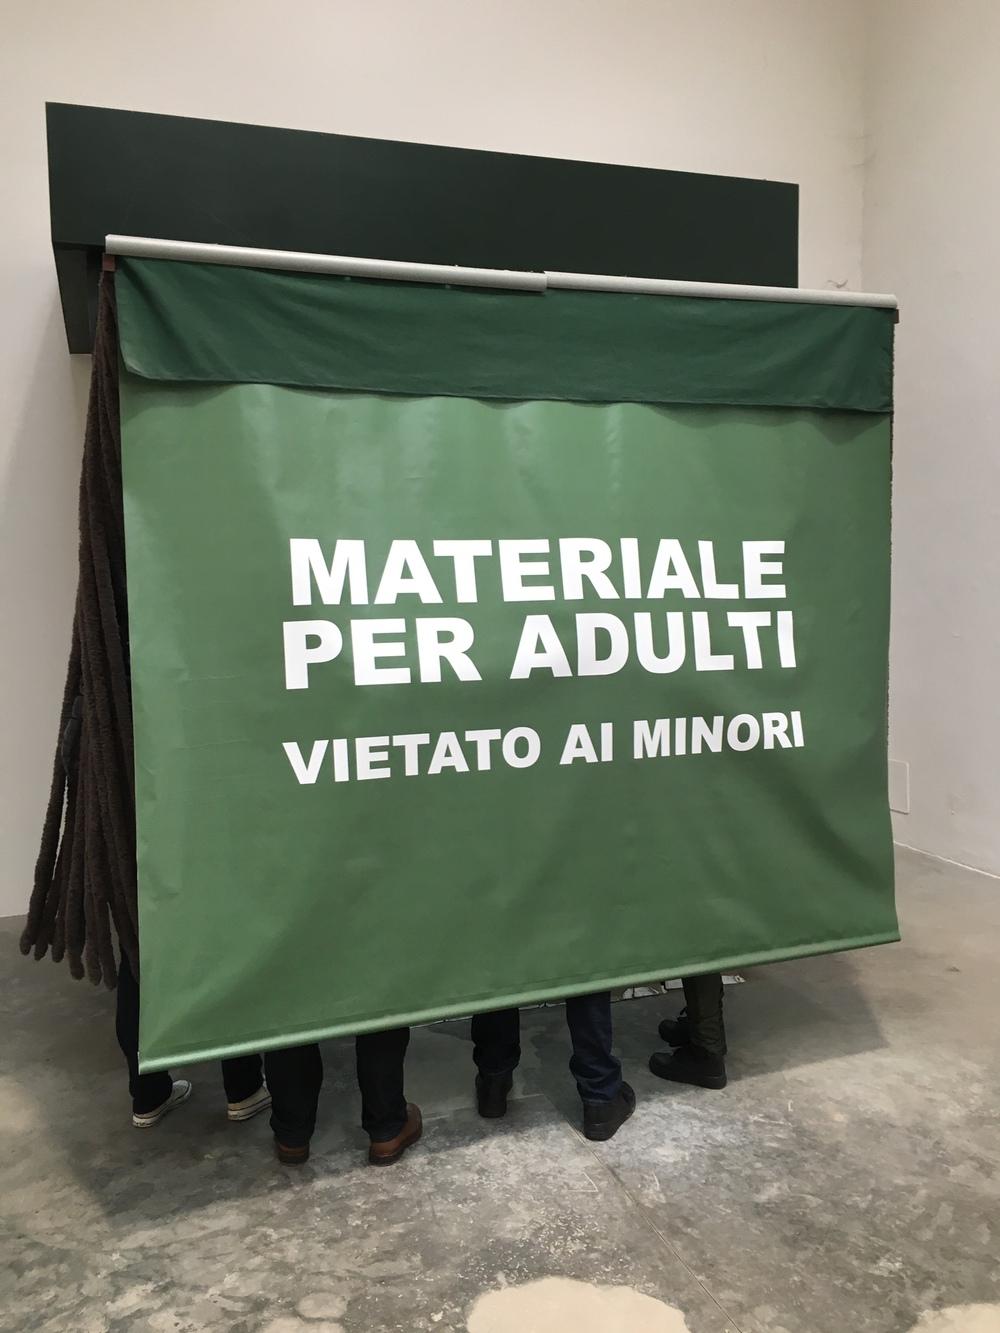 Artist Francesc Ruiz, Spanish Pavilion, la Biennale di Venezia 2015